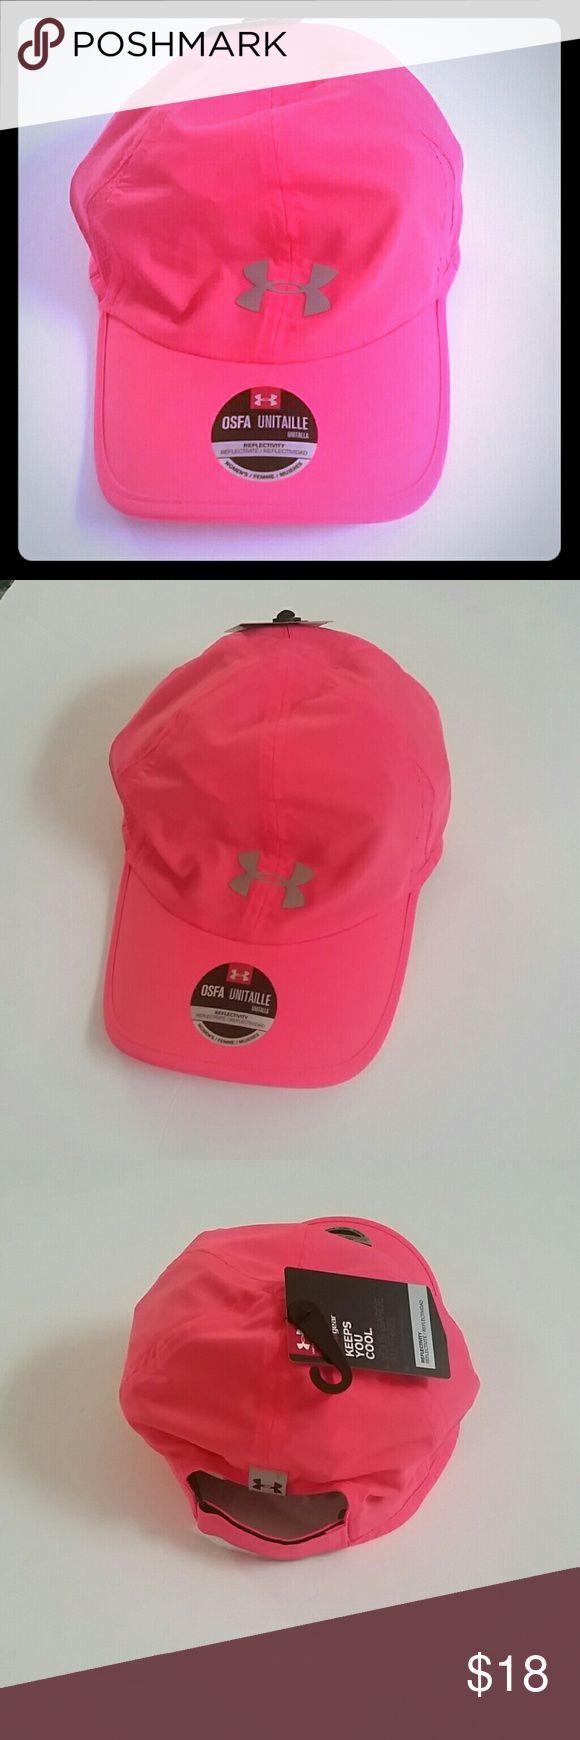 7781eab45ca Women s Under Armour Reflective Baseball Cap Boutique